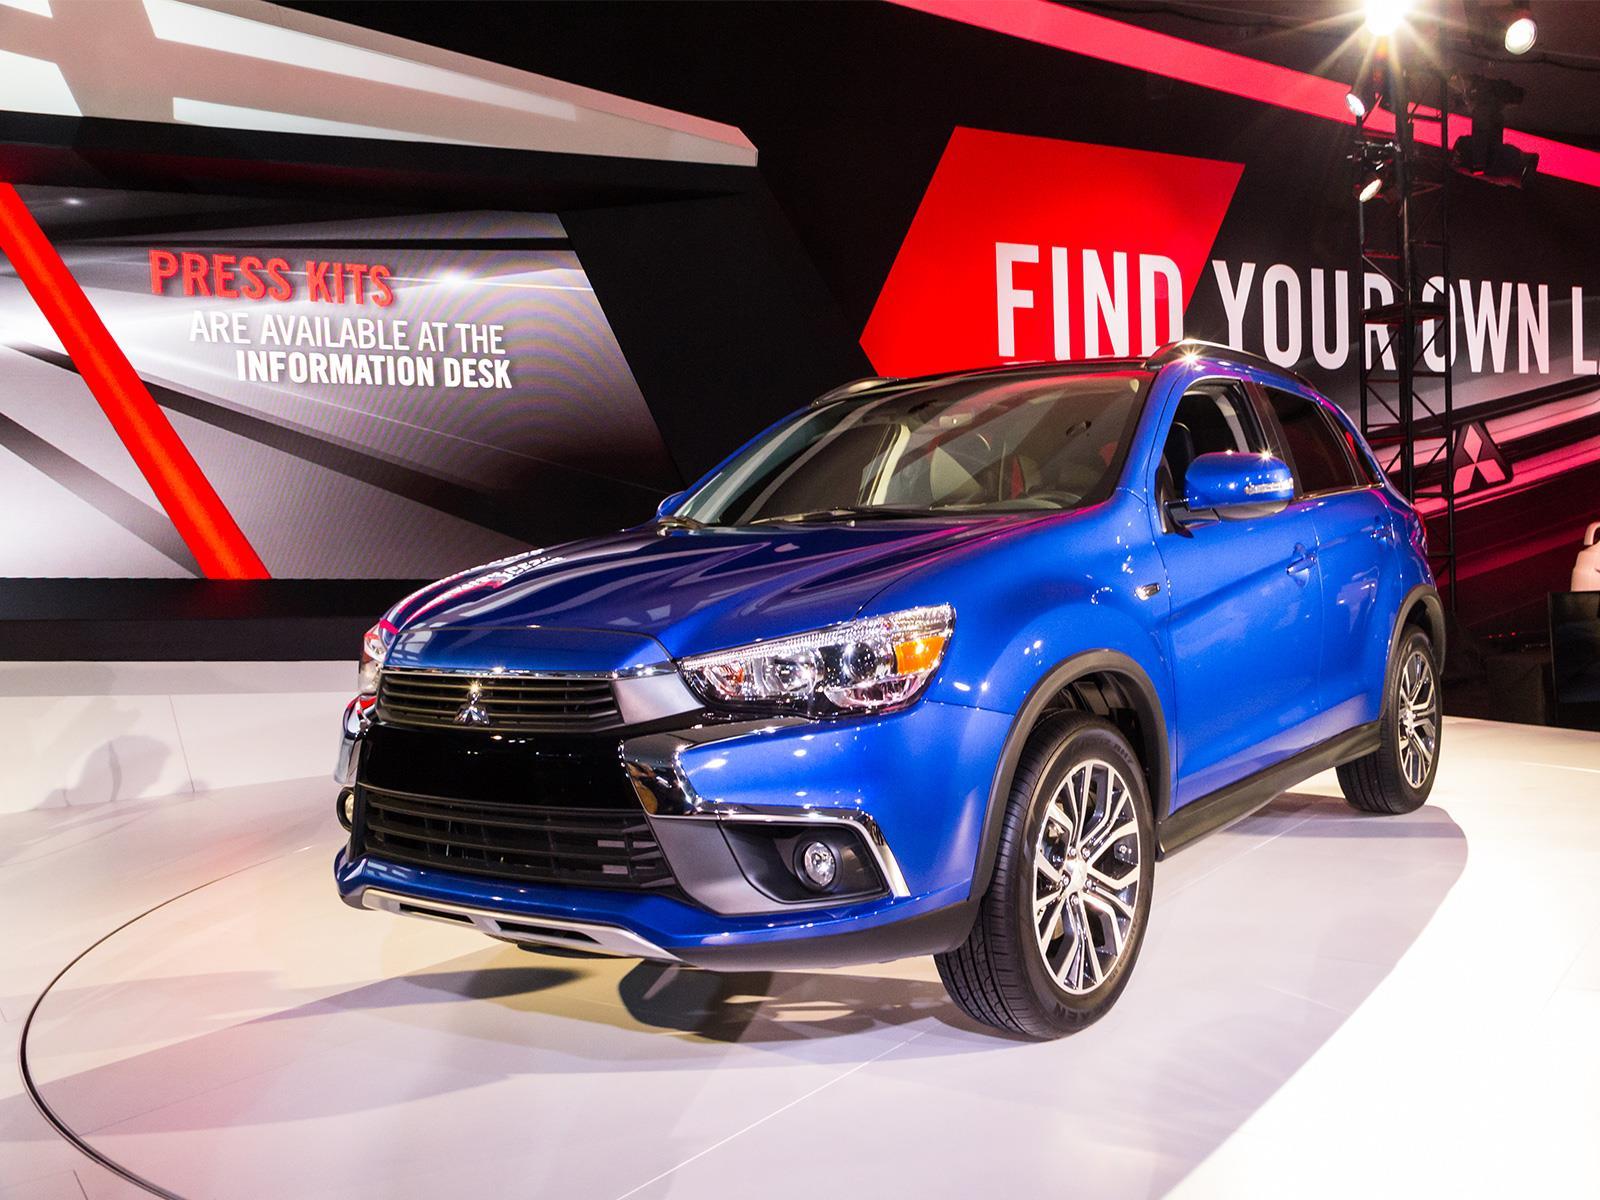 Auto Show de Los Ángeles 2015 - Mitsubishi ASX 2017 se ...